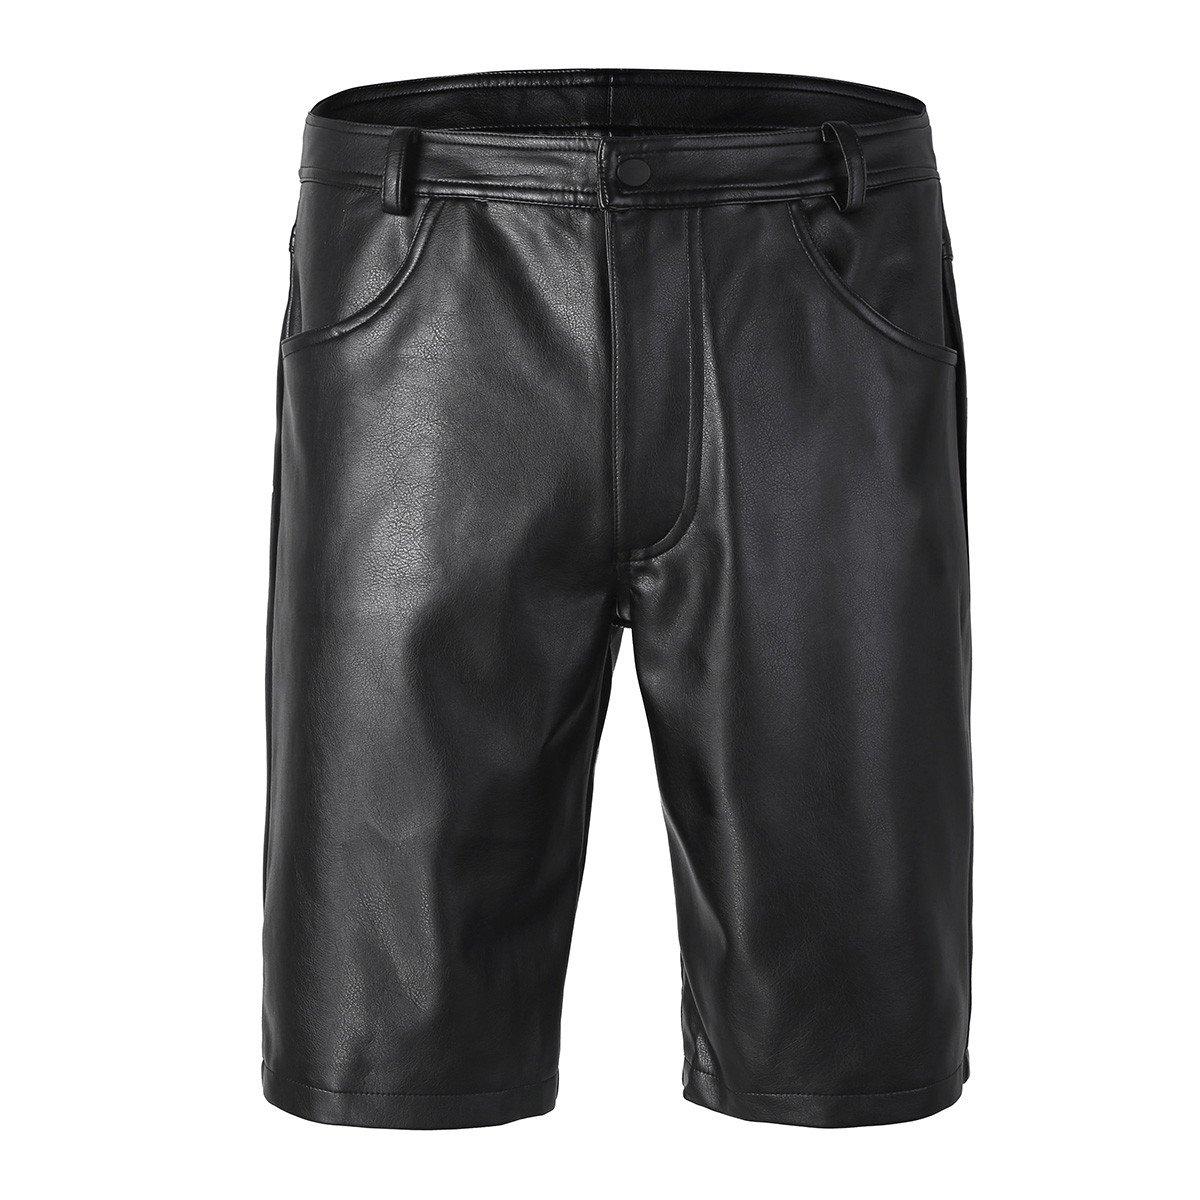 YiZYiF Men's Black Leather Cargo Shorts Sports Underwear Leg Bermuda Zipper Pants